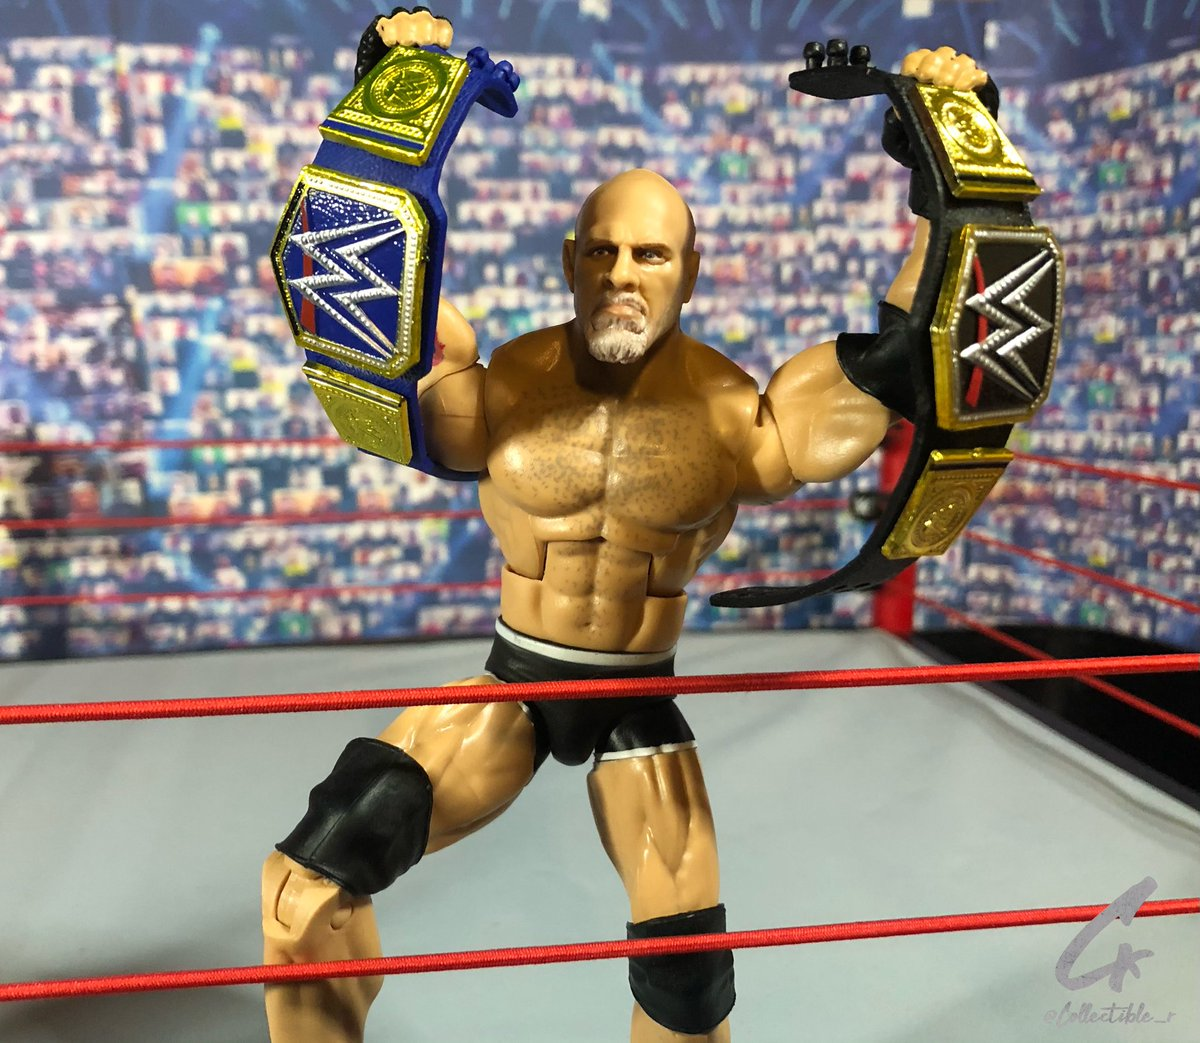 GOLDBERG @Goldberg #Goldberg #WCW #WWE #WWERaw #Legend @Mattel #WrestleMania